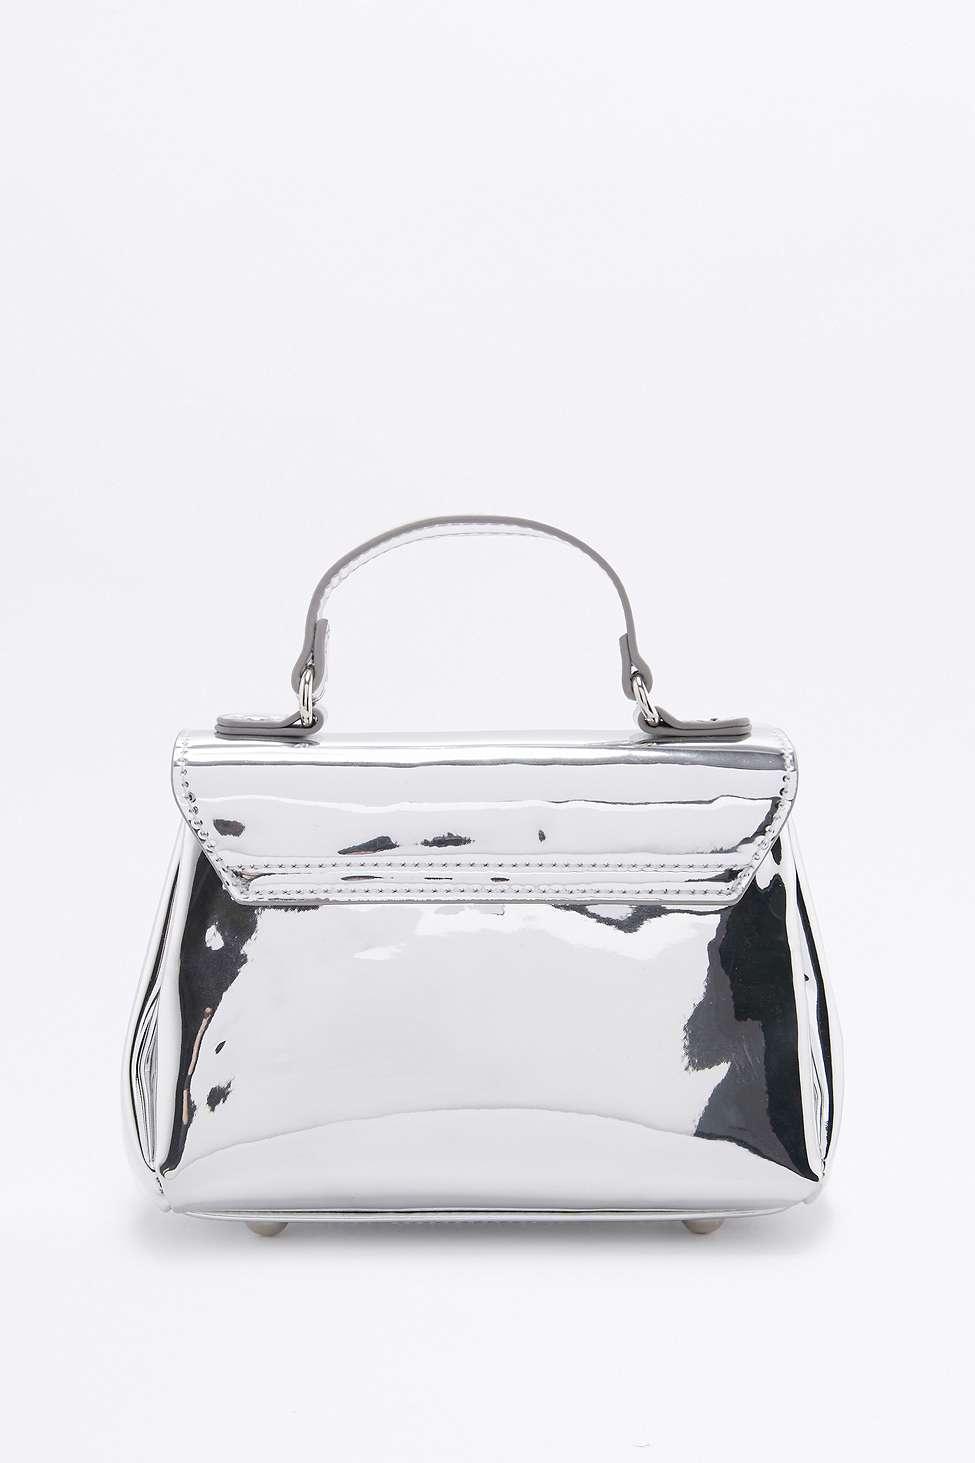 Urban Outfitters Silver Flap Mini Cross Body in Metallic